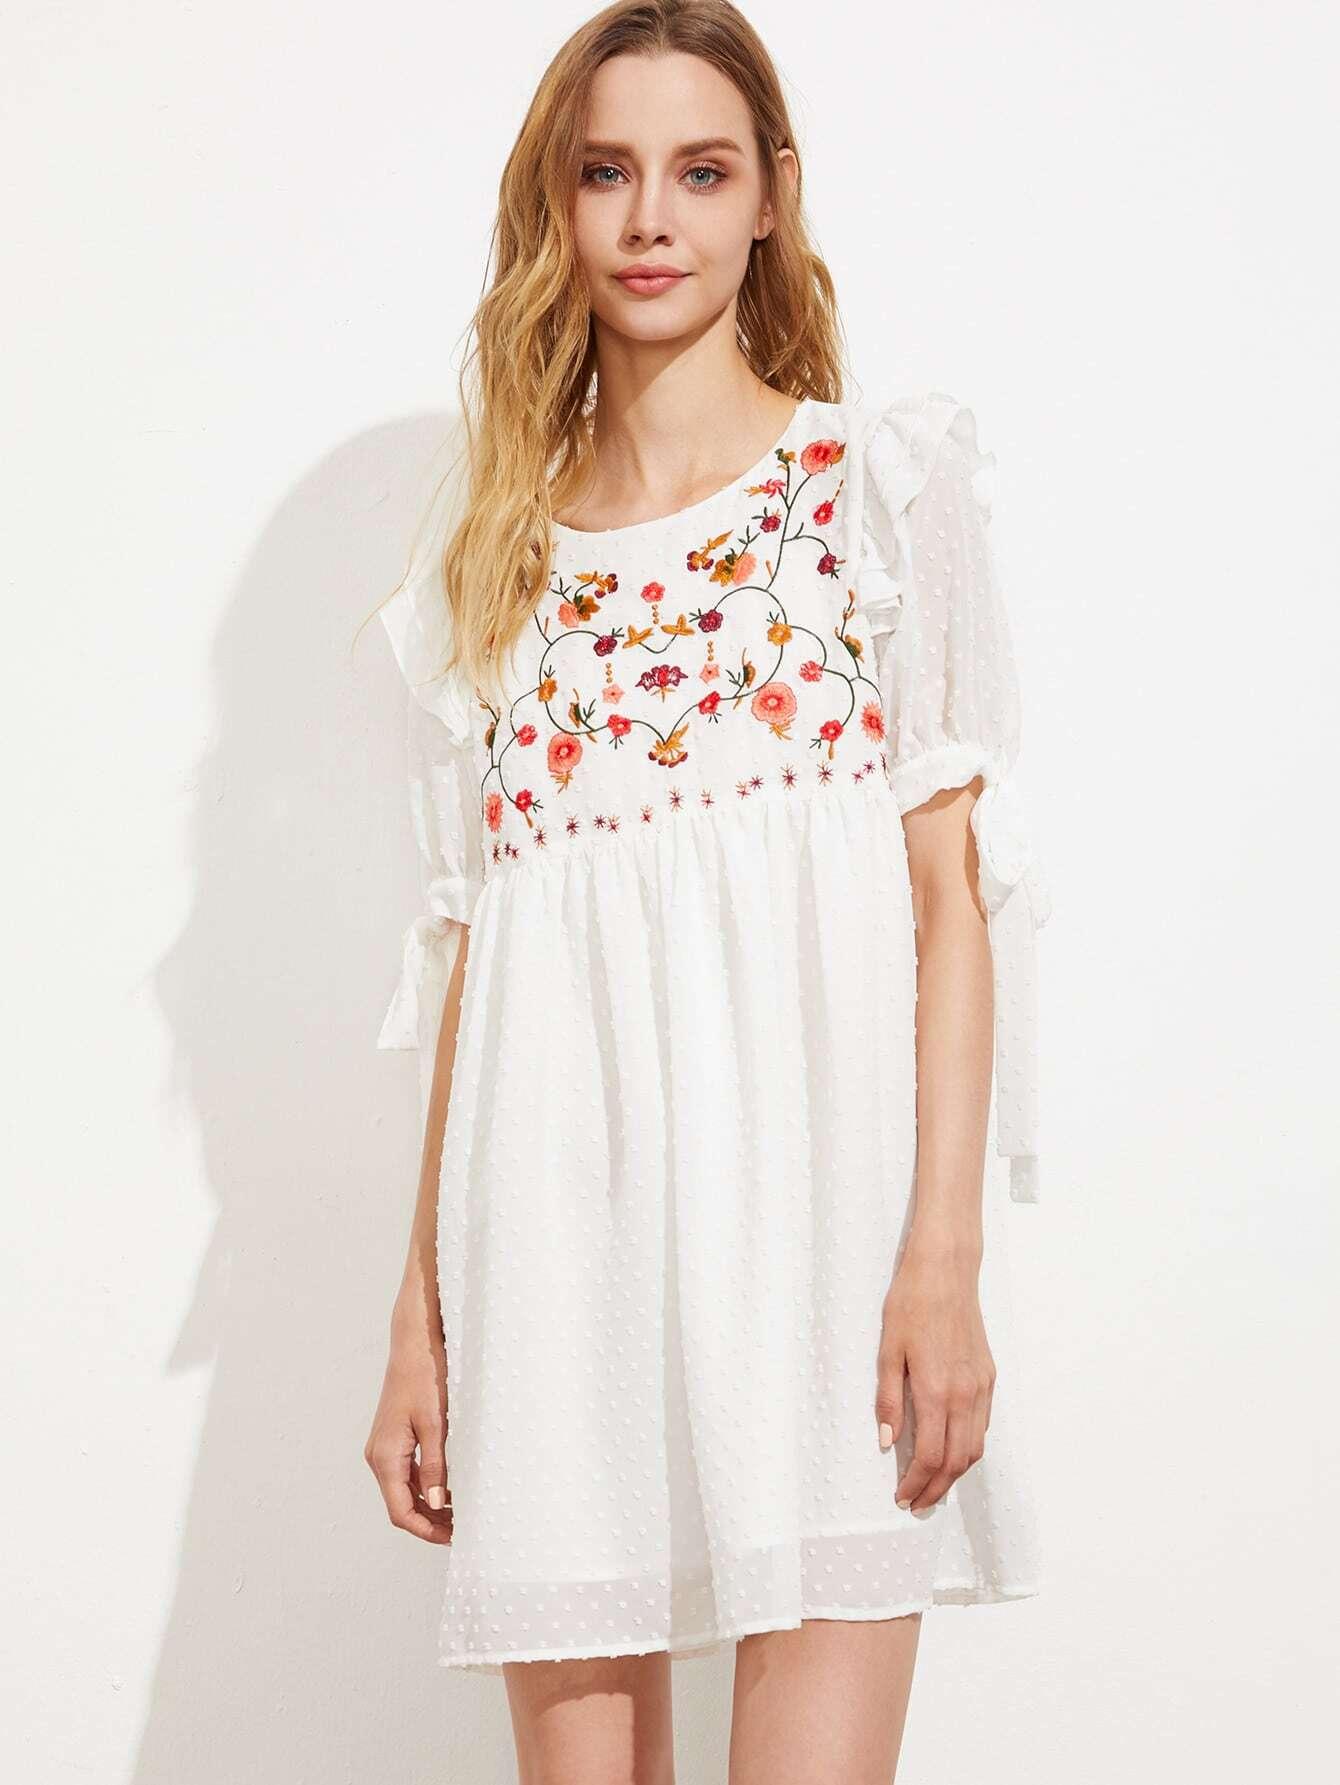 Фото Embroidered Yoke Tie Sleeve Dot Jacquard Babydoll Dress. Купить с доставкой